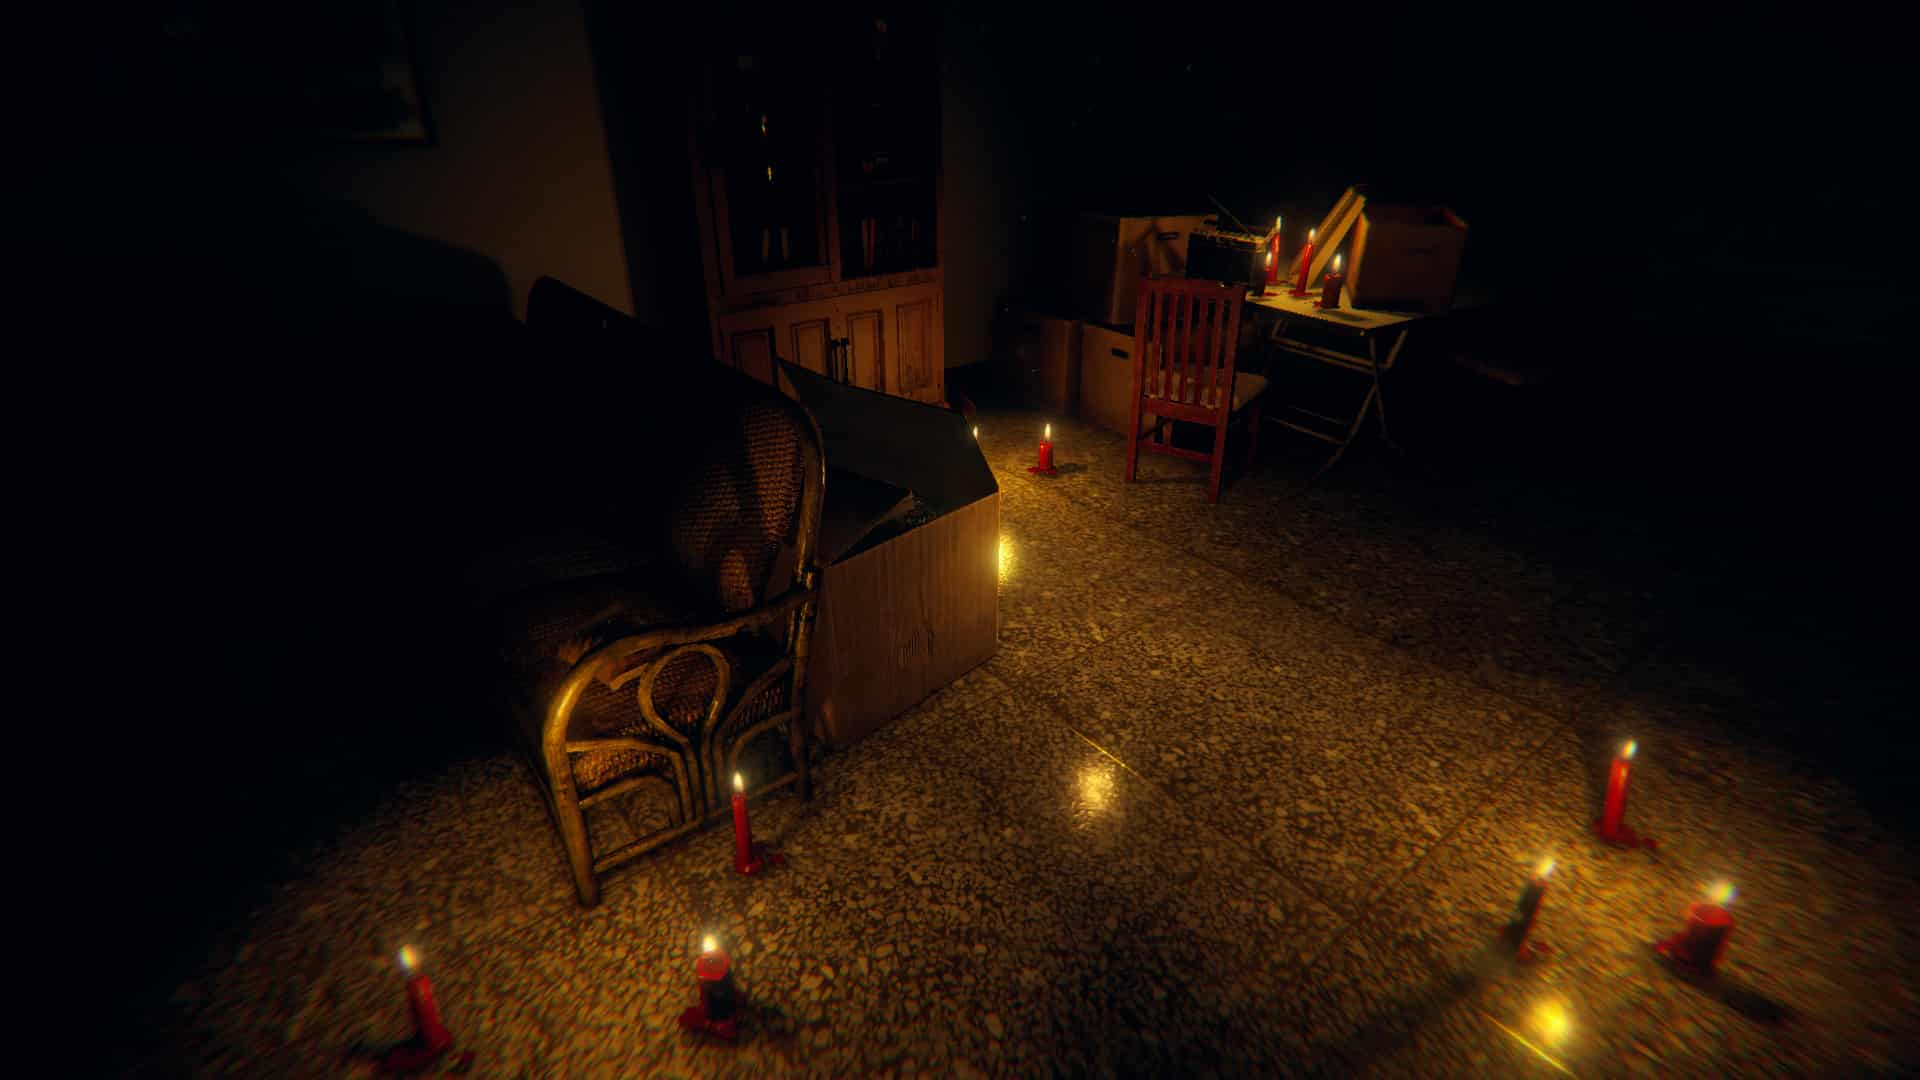 Devotion Red Candle Games review unique horror strange conclusion ending areas Feng Yu Mei Shin Li Fang